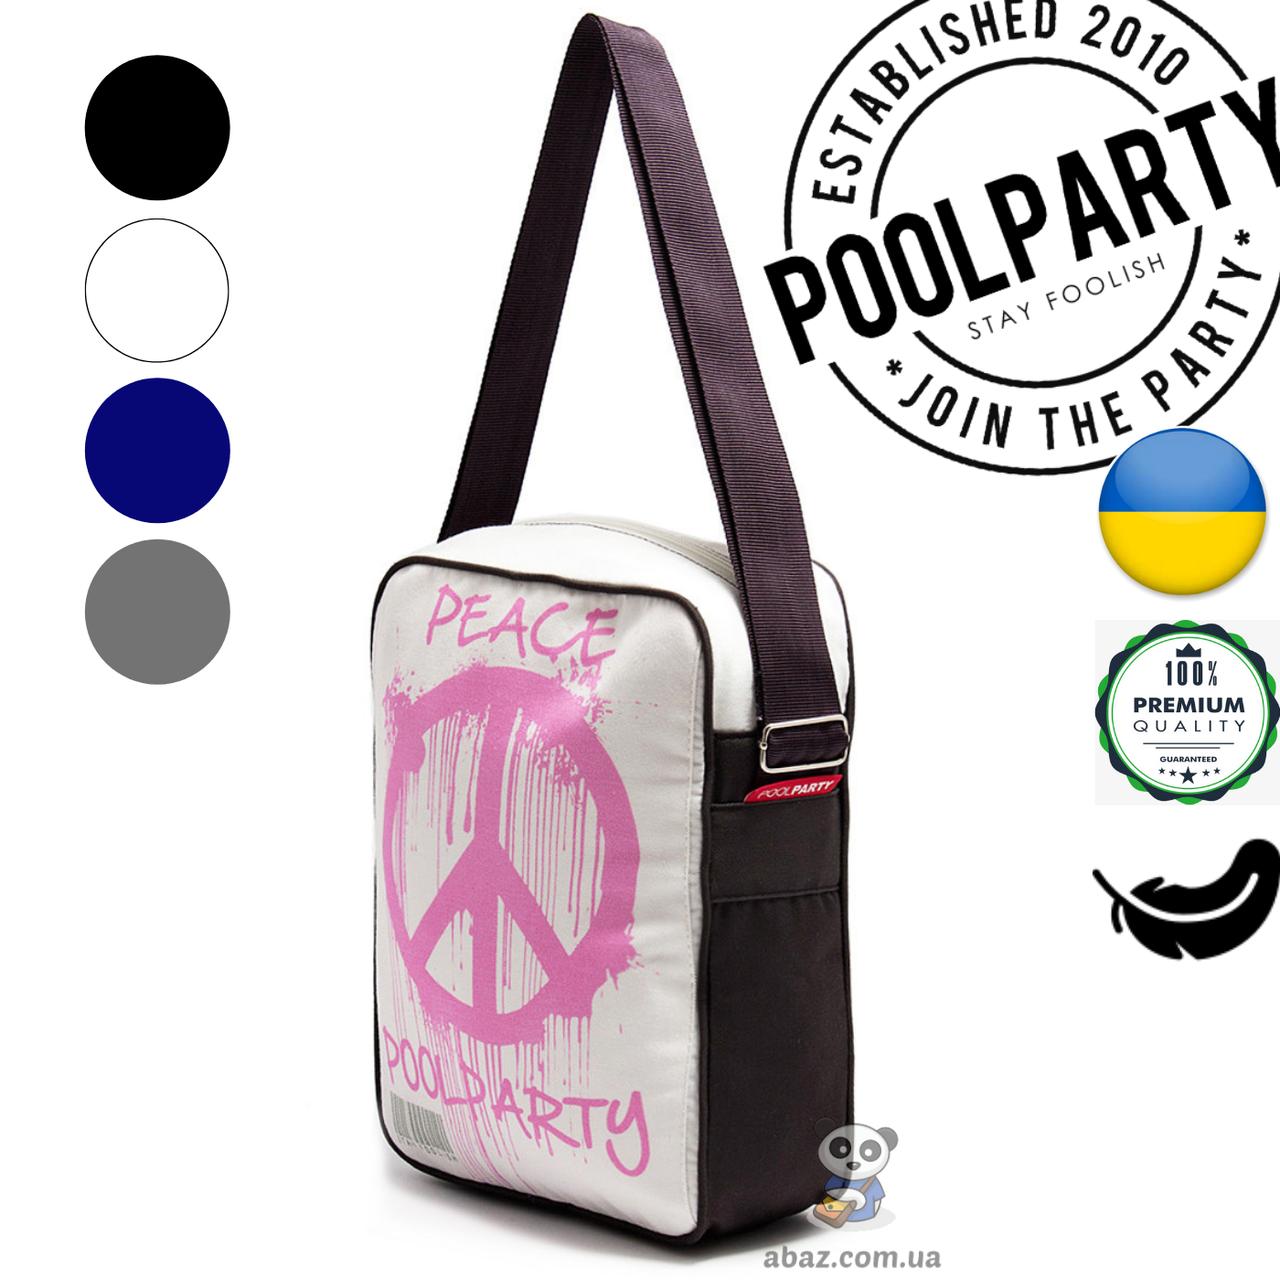 a7d97ab54796 Мужская сумка белая Poolparty Pool18 Peace хлопок с ремнем на плечо -  abaz.com.